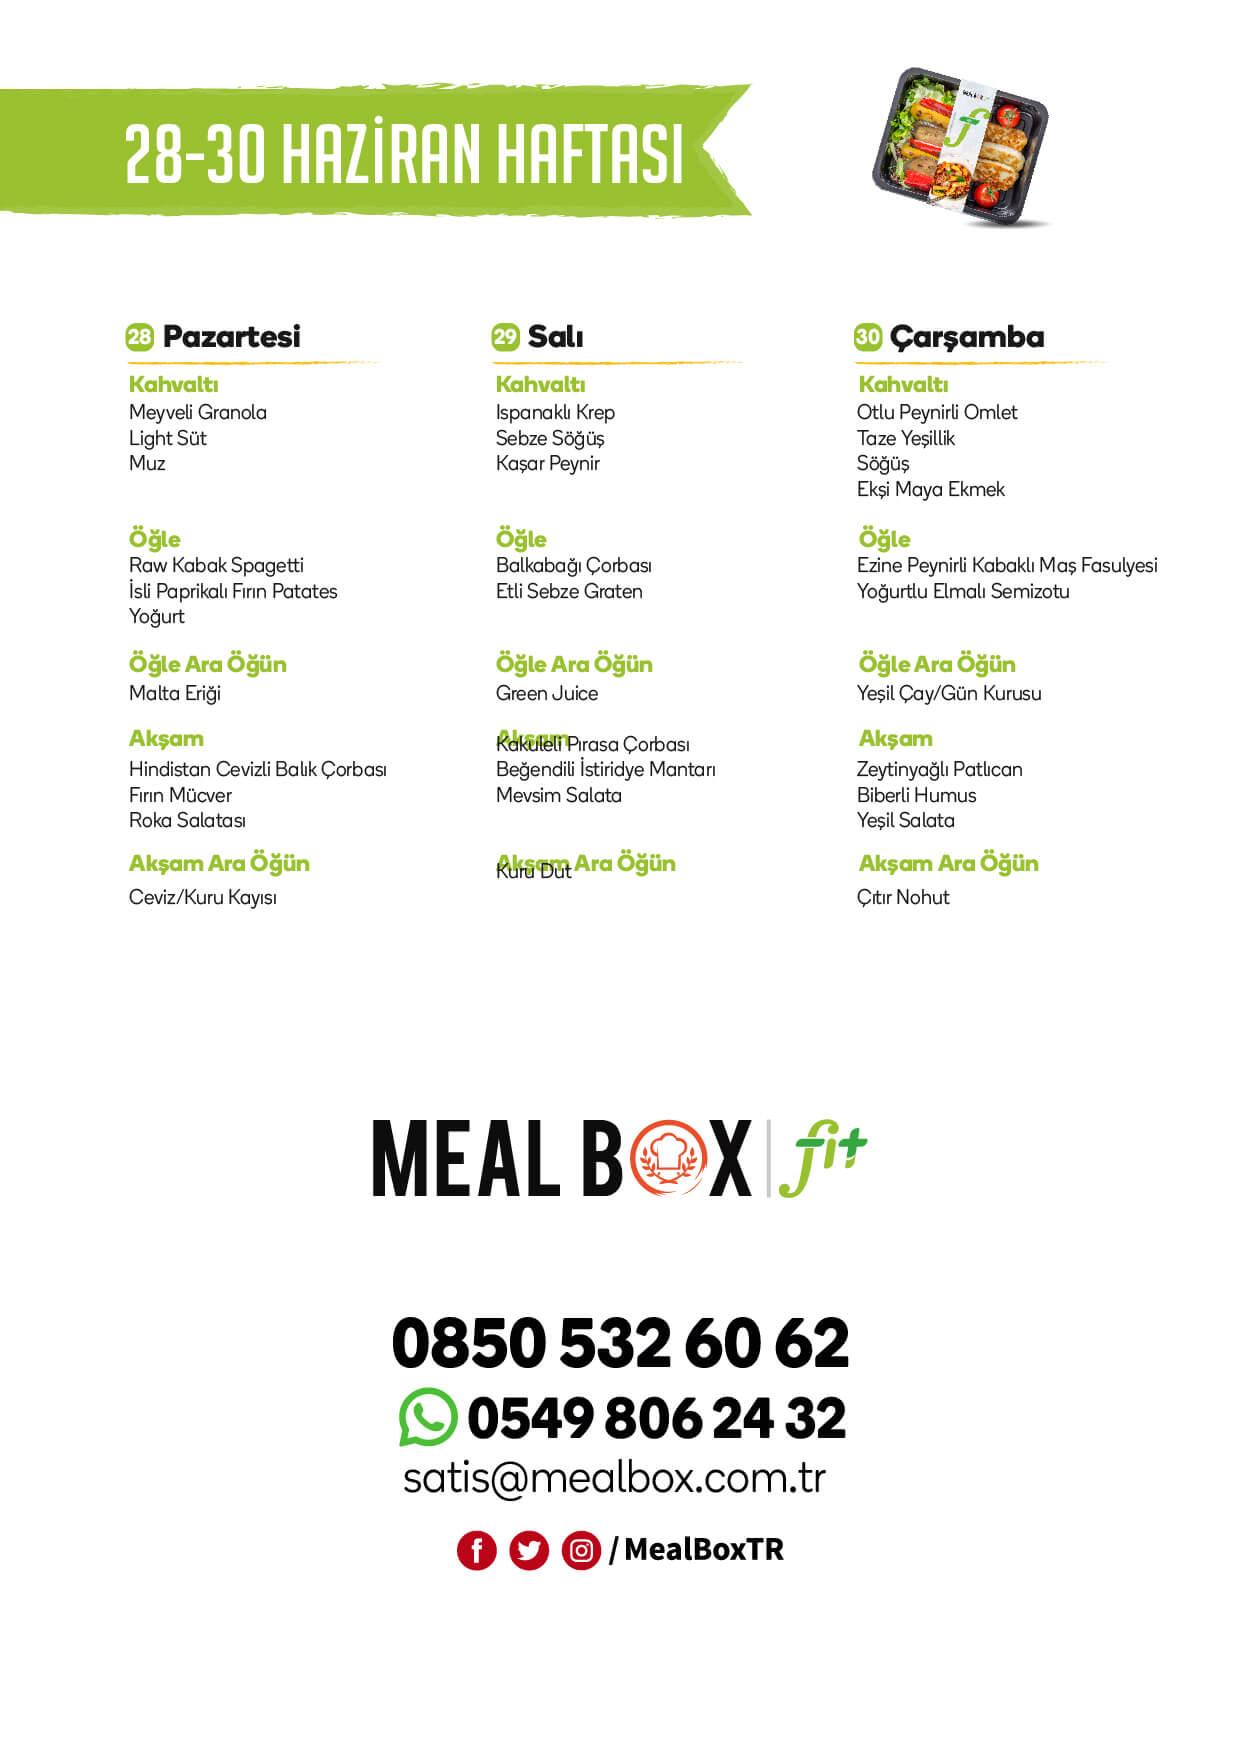 Meal Box Fit Menüsü